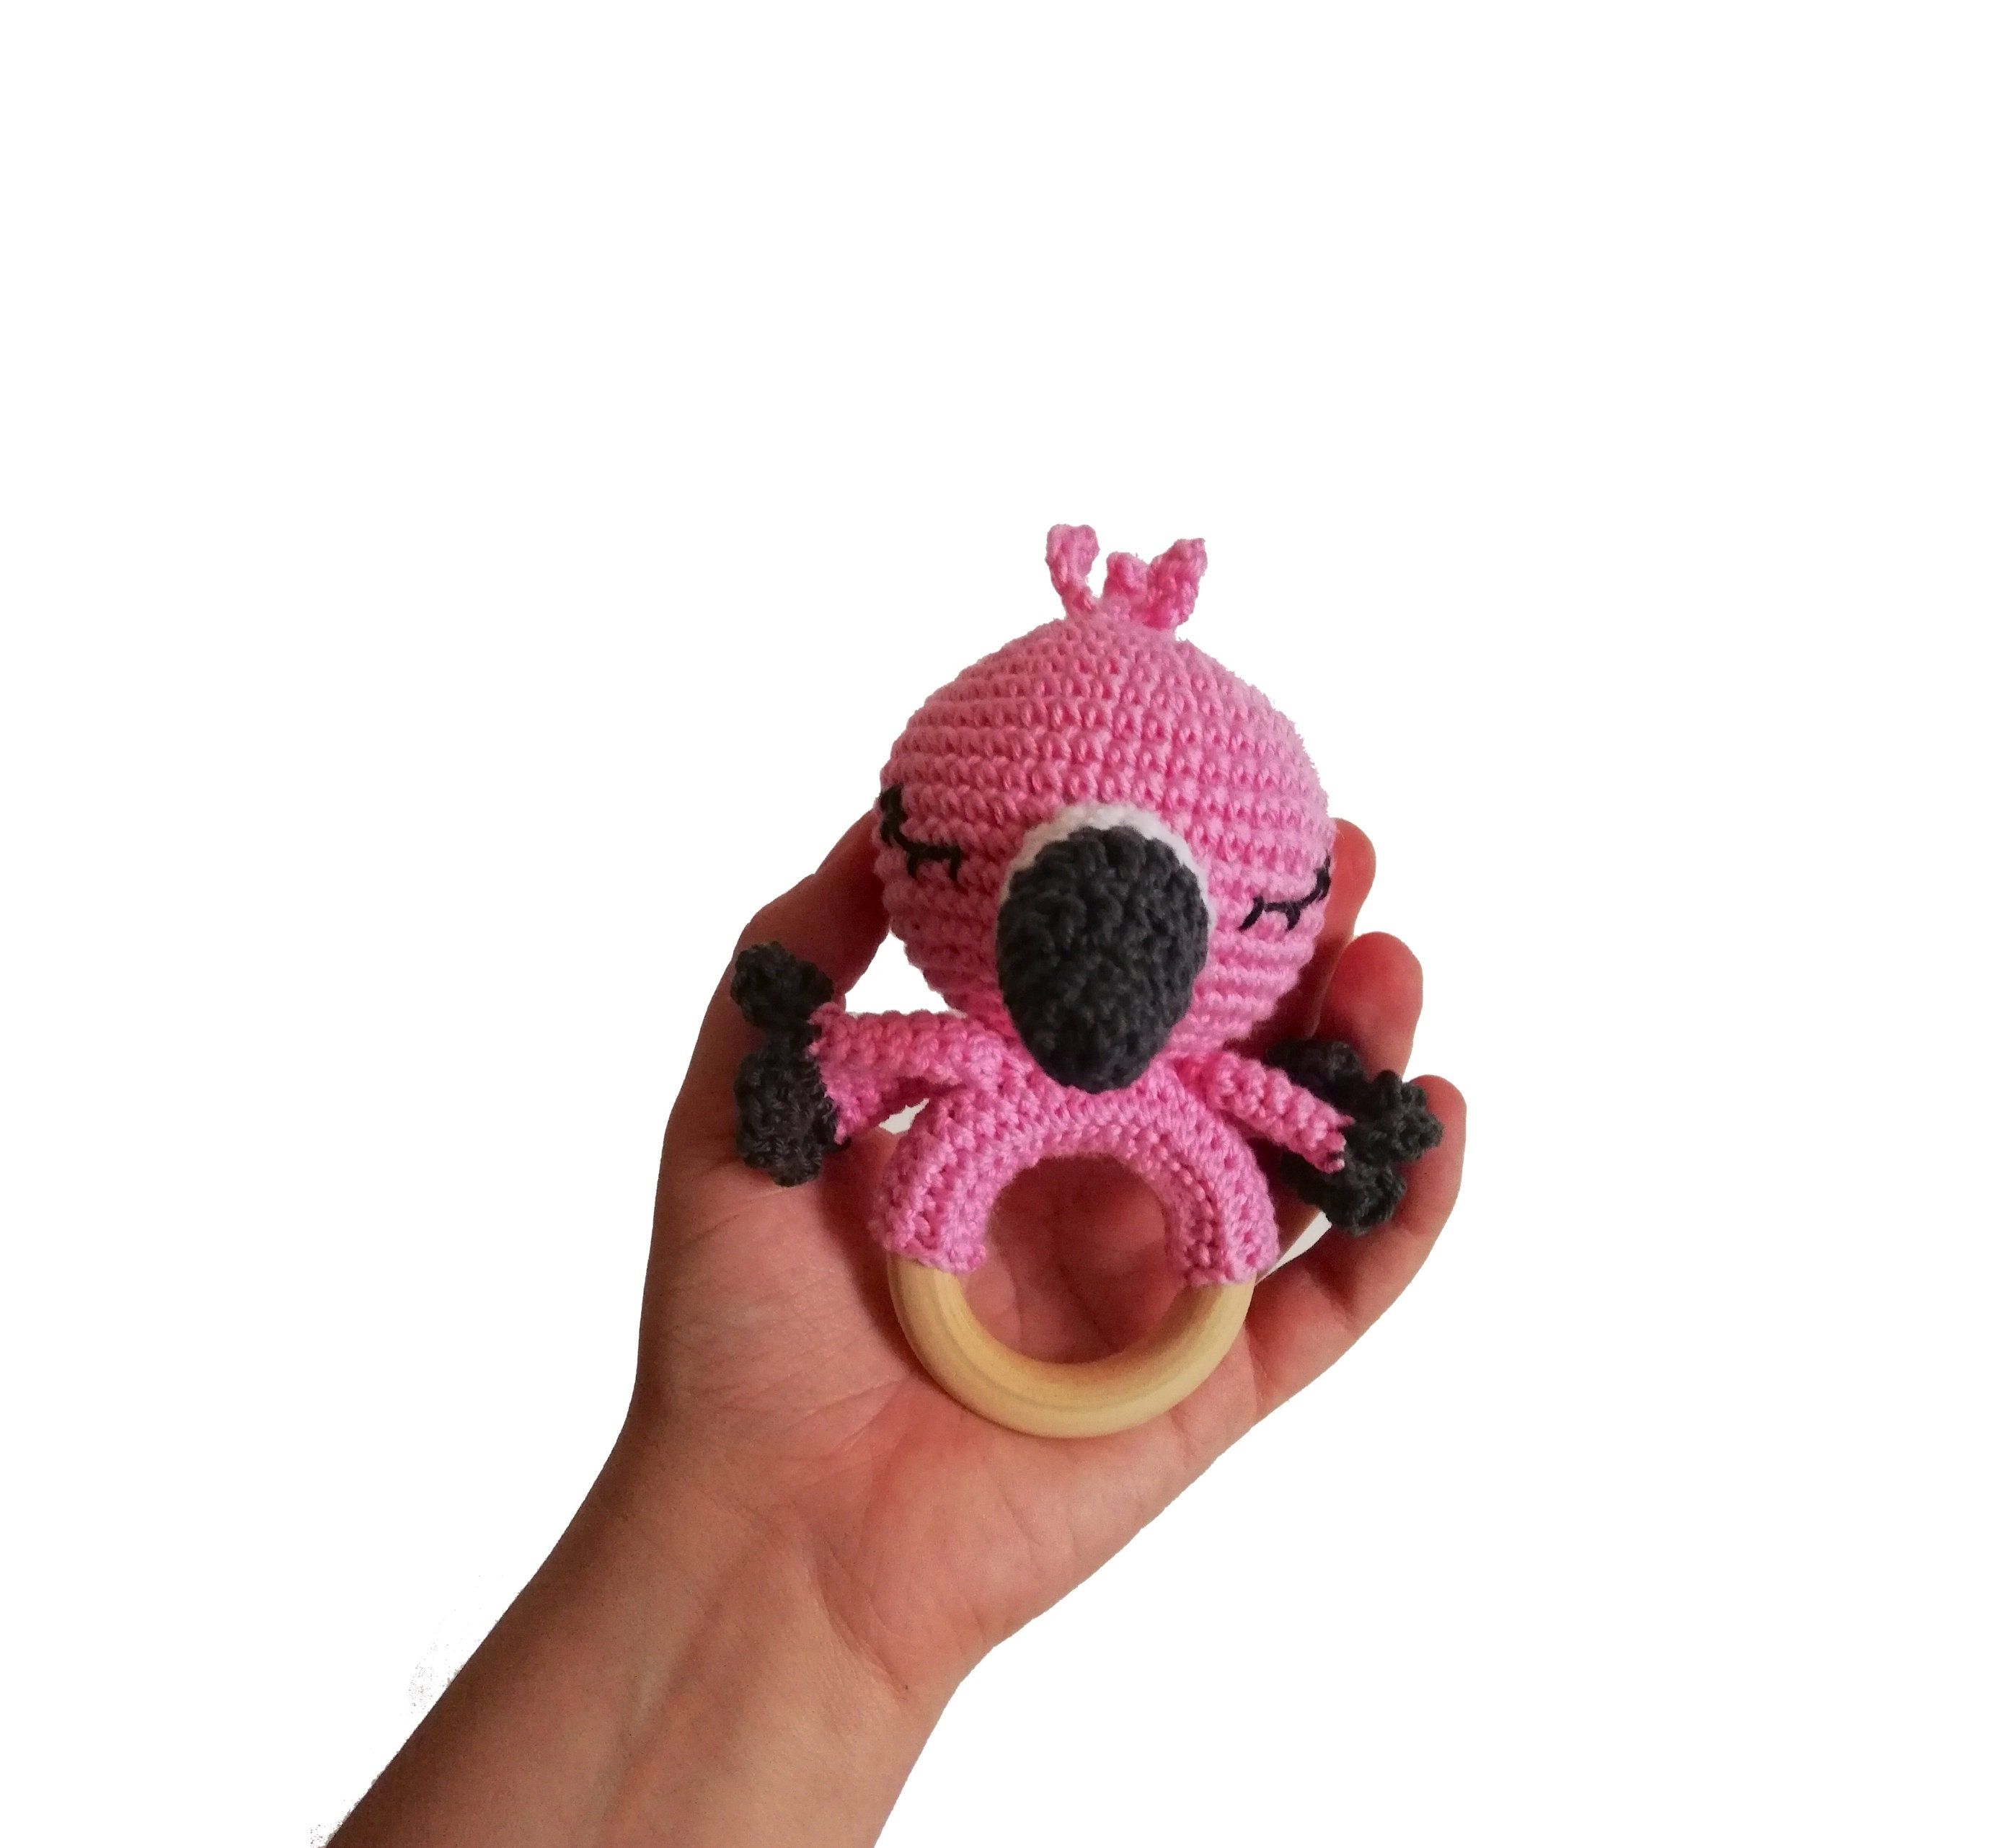 Crochet Pattern Amigurumi Flamingo Teether Teethering Rattle